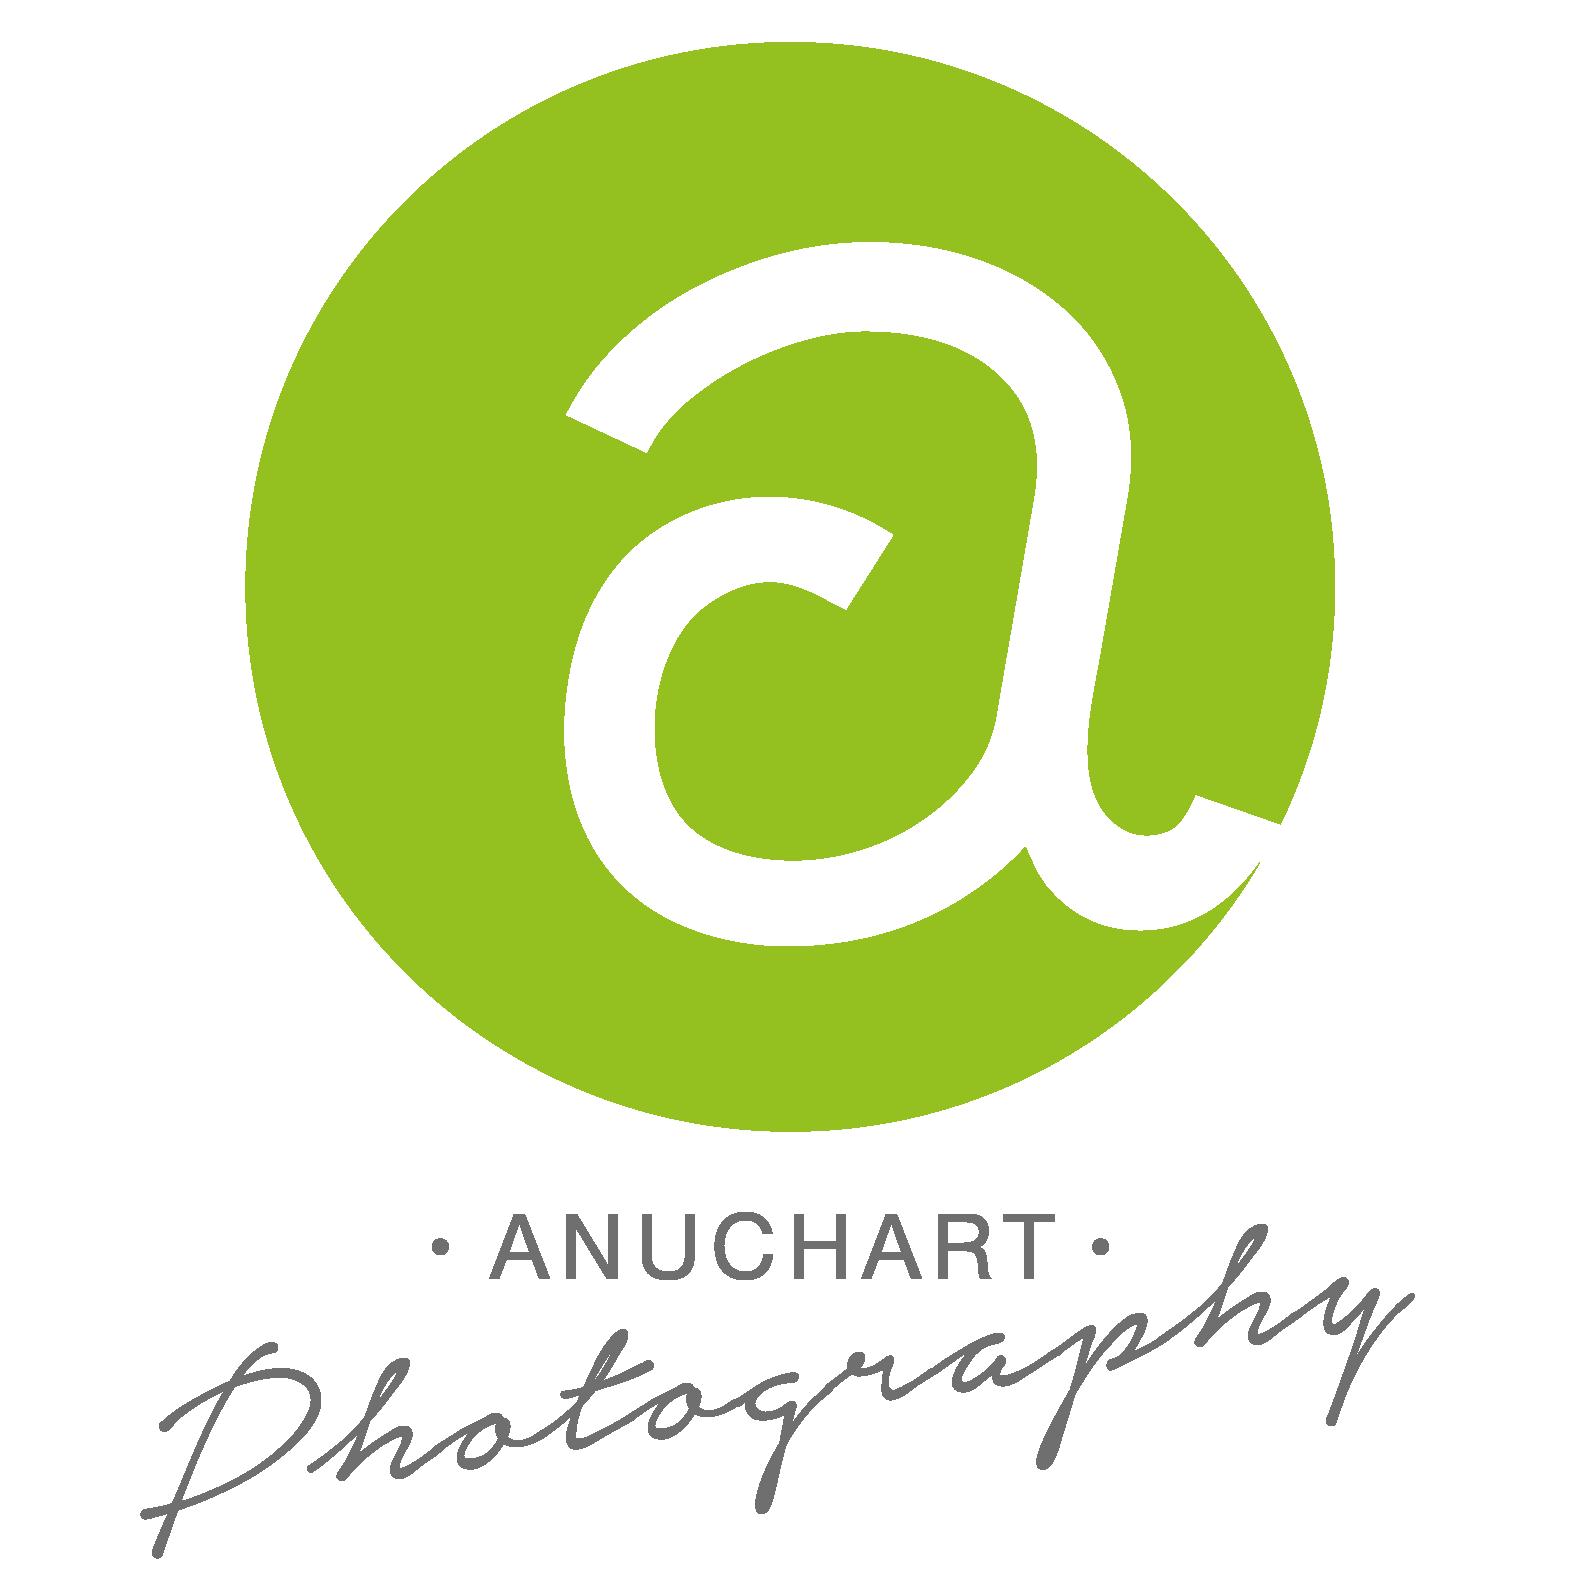 Anuchartphotography.com